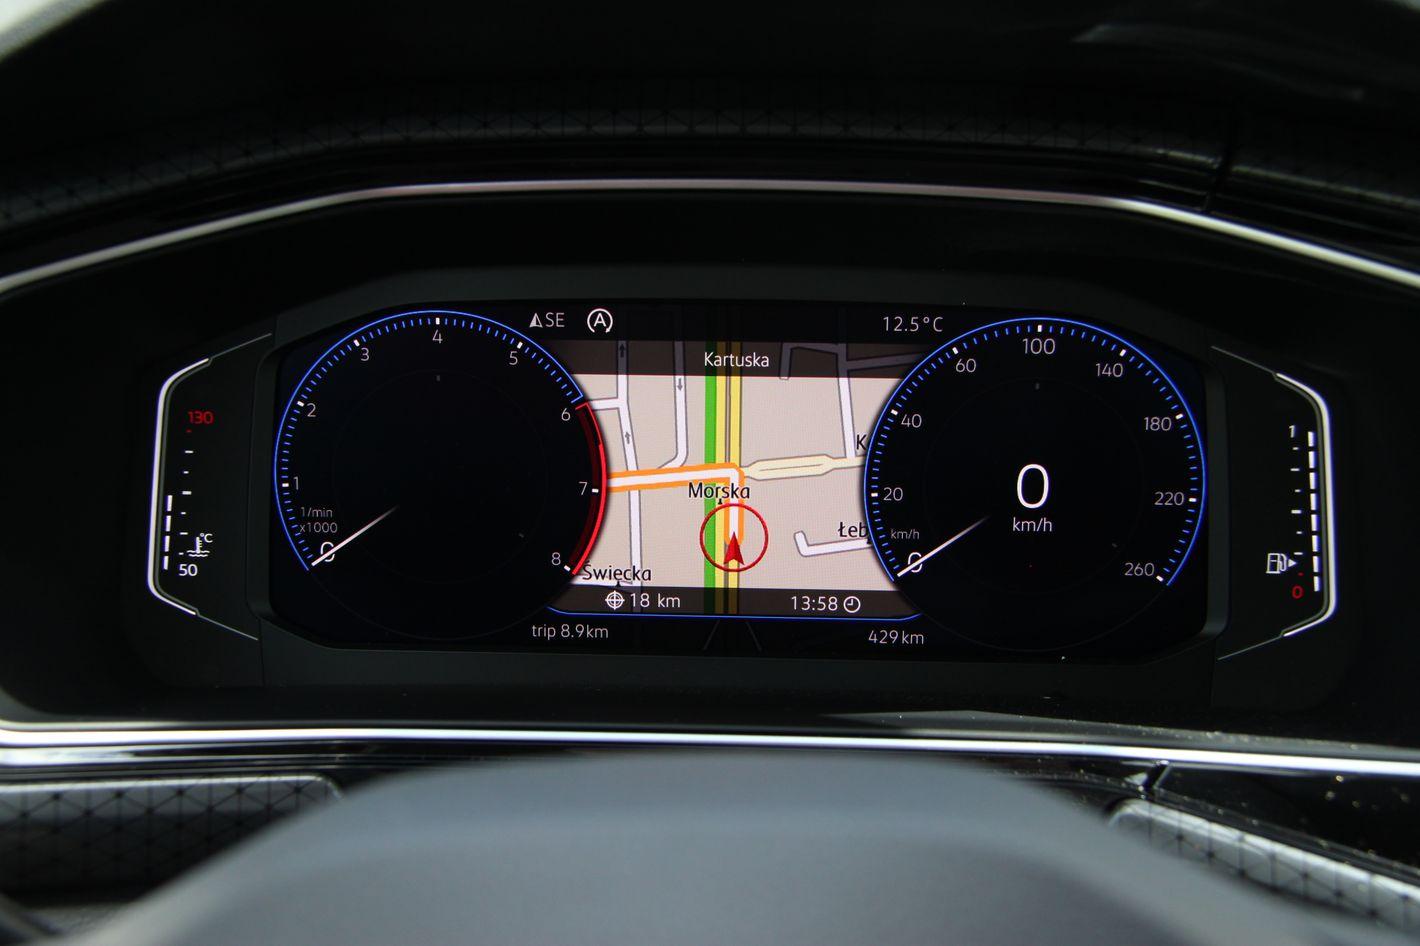 Volkswagen T-Cross wirtualny kokpit